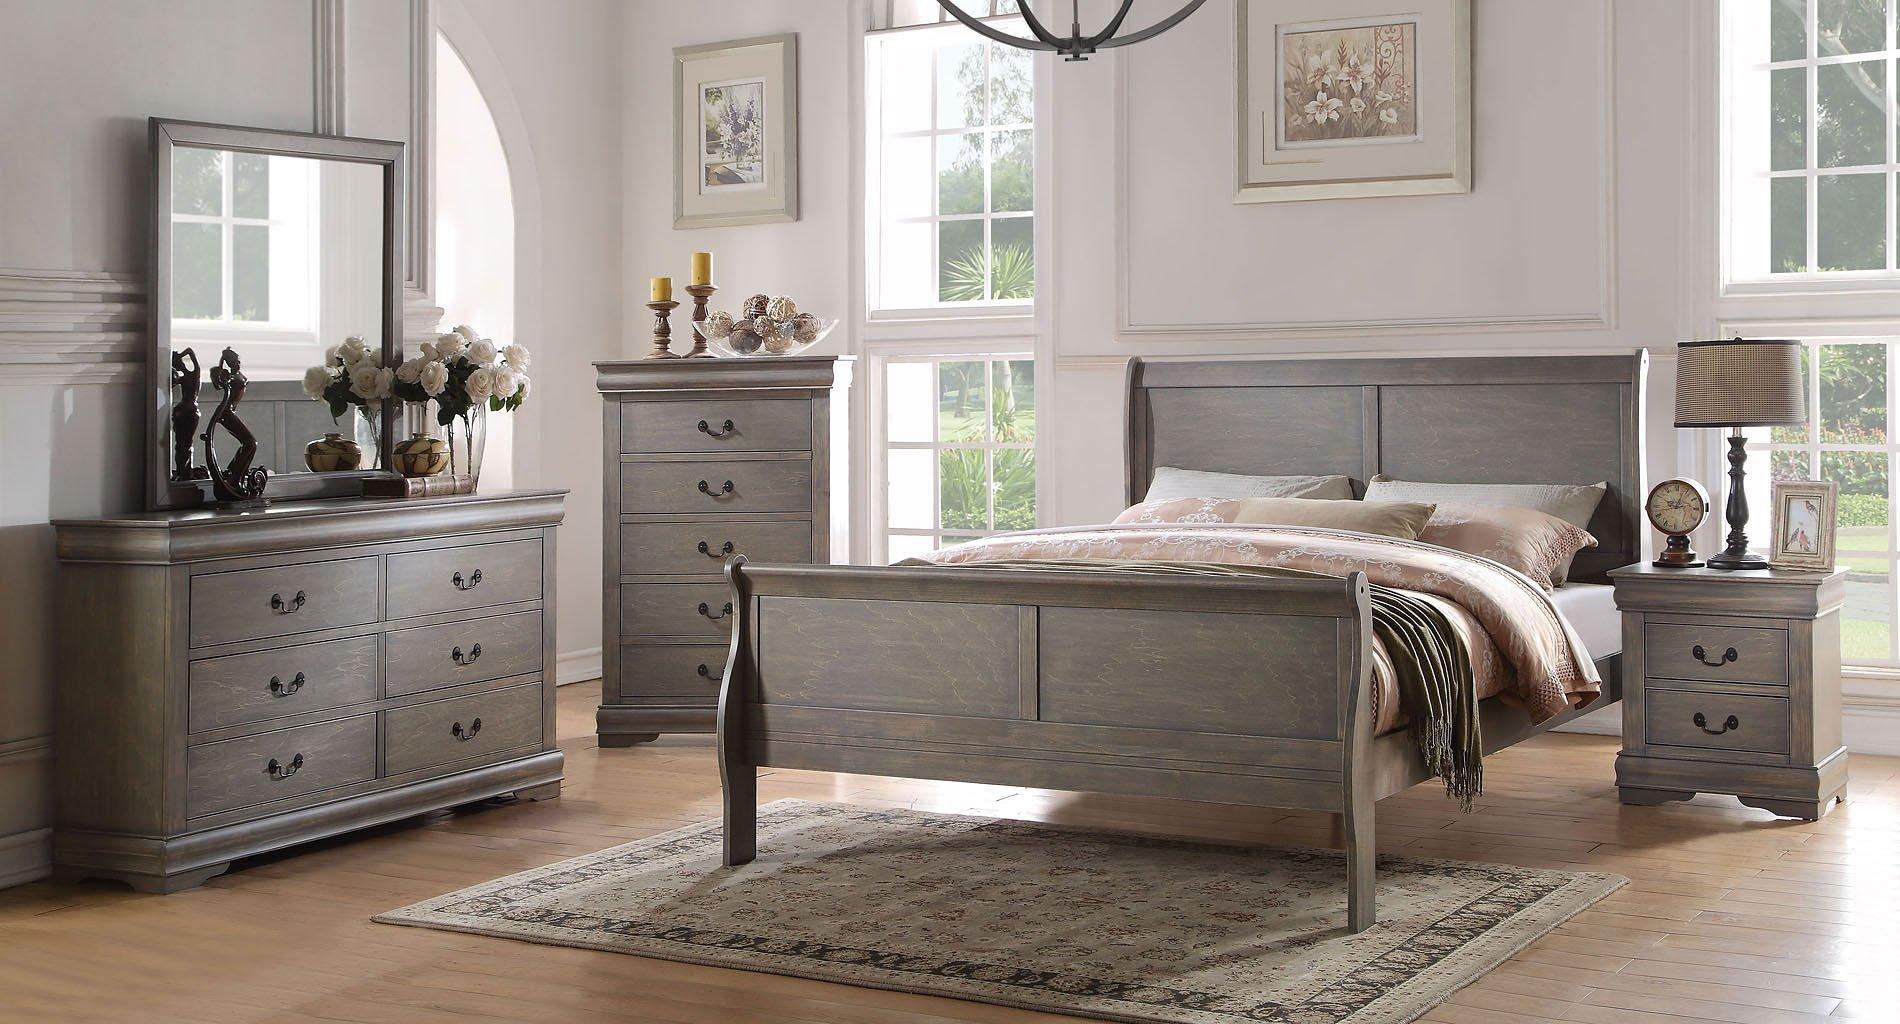 Louis philippe sleigh bedroom set antique gray acme - Louis philippe bedroom collection ...